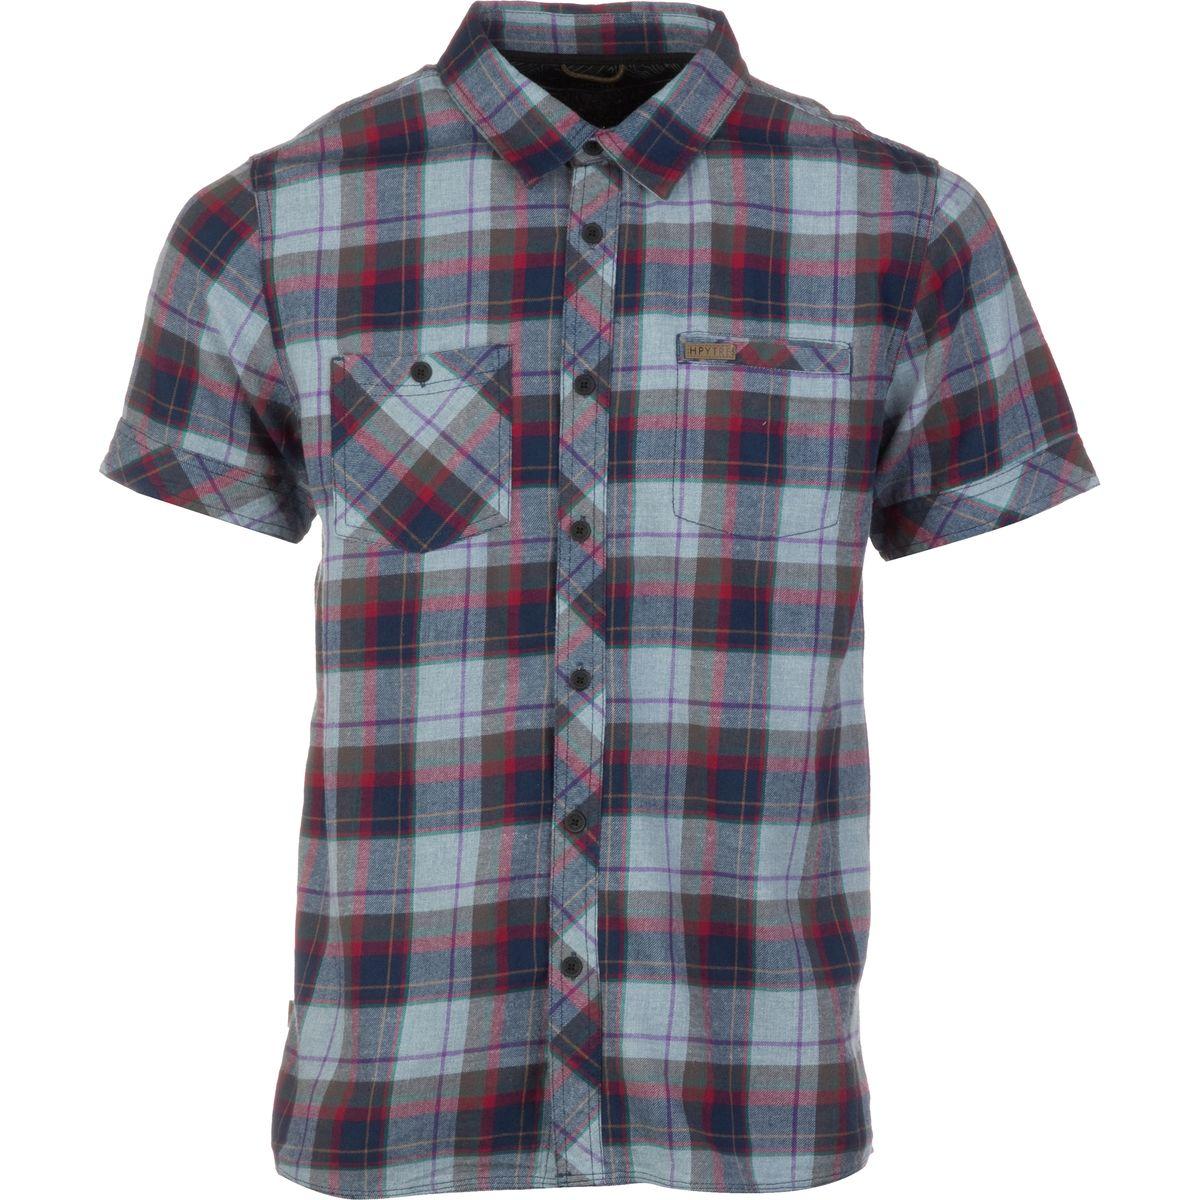 Shop bestselling Men's shirts at Vans including Long & Short Sleeve Button Down, Stripe, Plaid, Floral, Paisley Print & More. Shop Shirts at Vans!